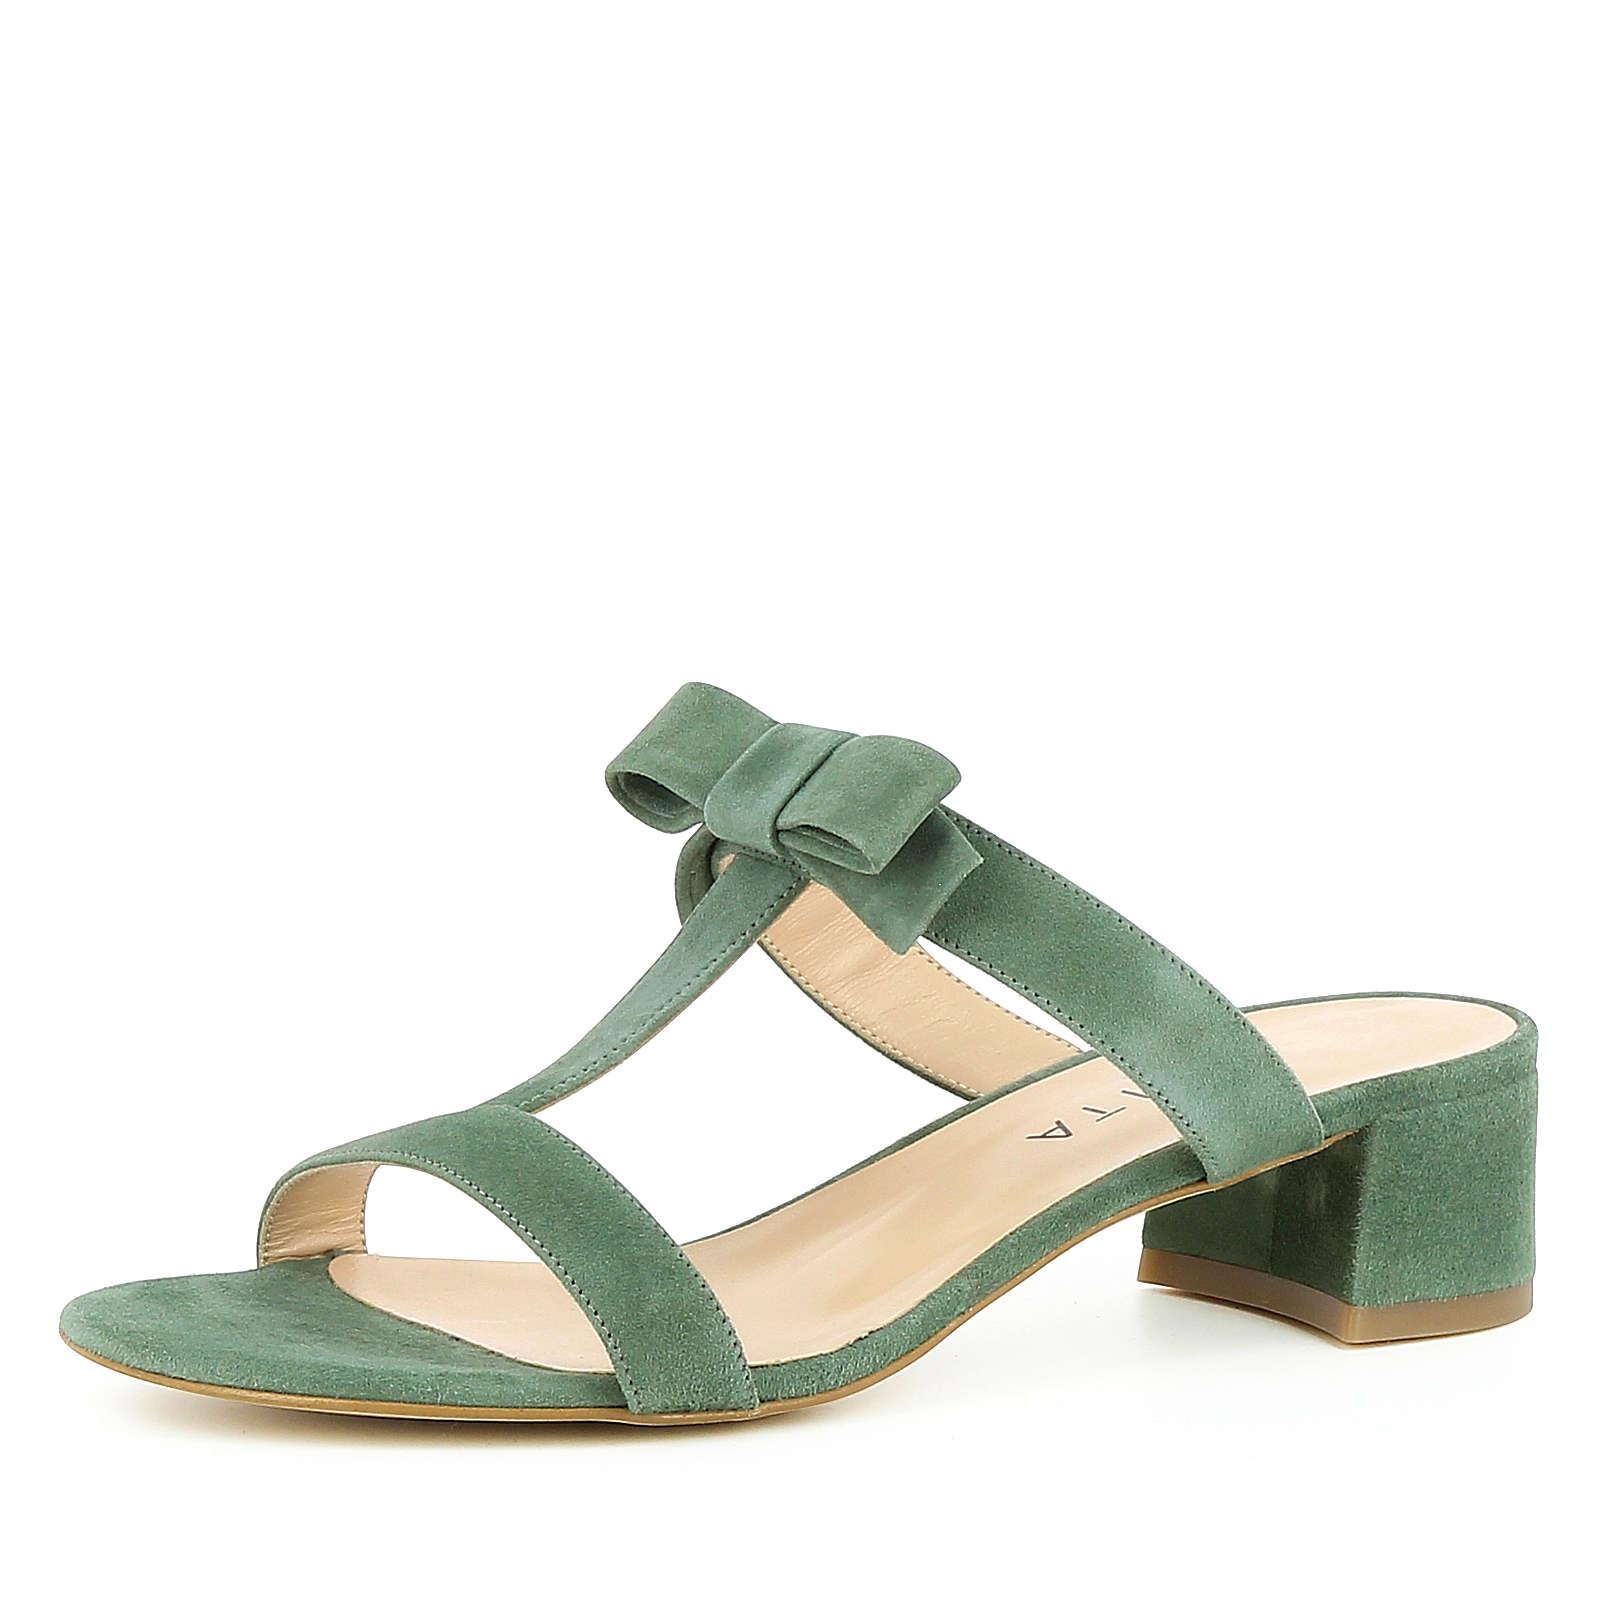 Evita Shoes Damen Sandalette DARIA Klassische Sandaletten natur/oliv Damen Gr. 40